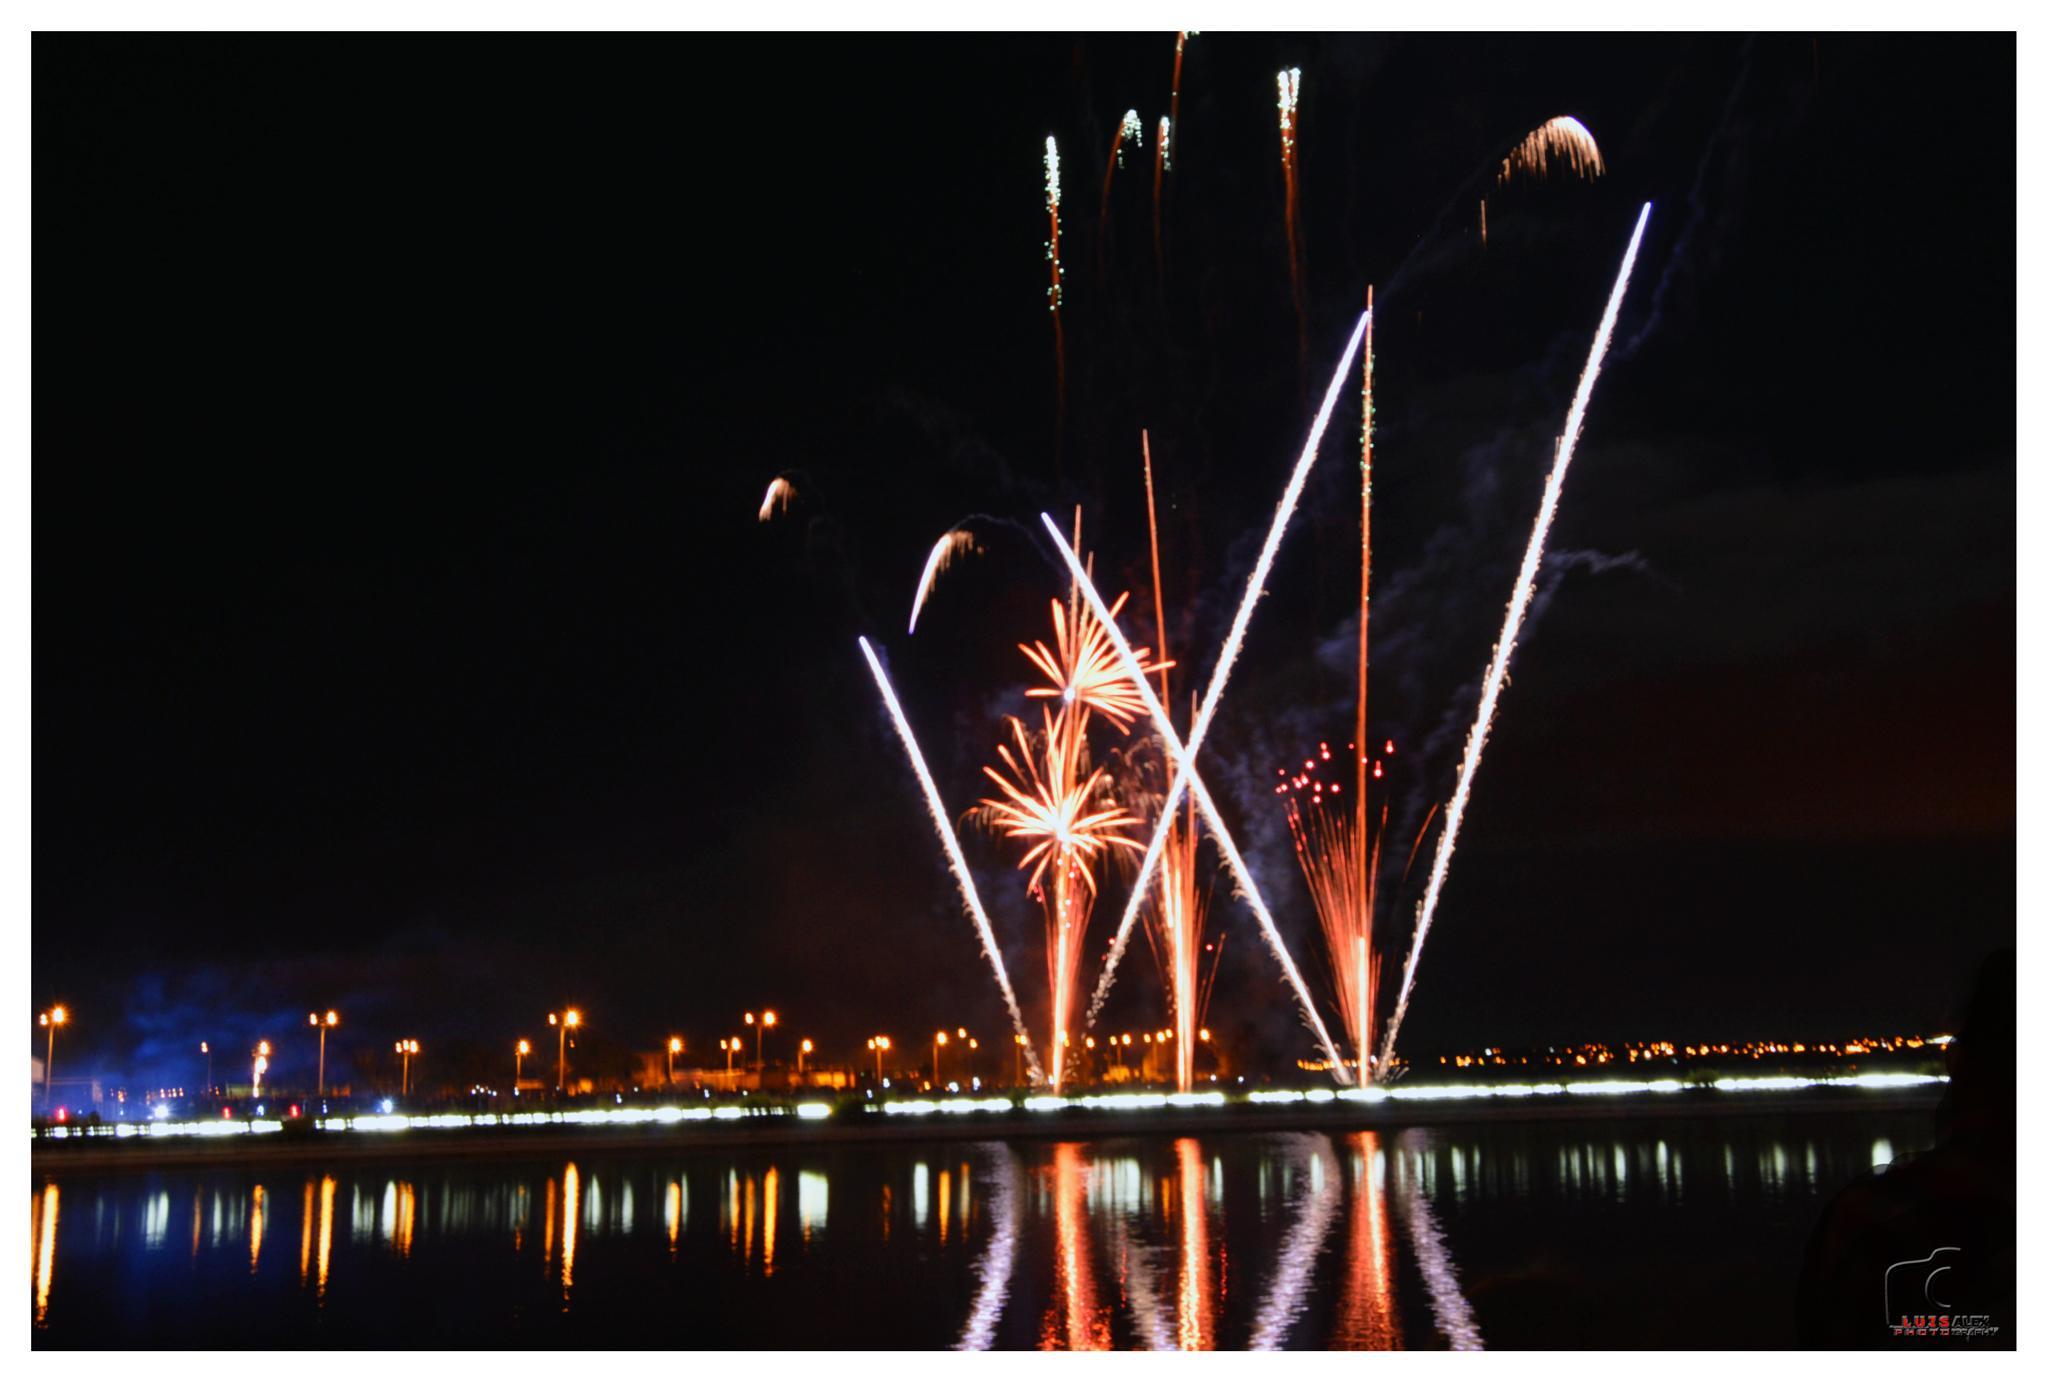 fireworks by Luís Alex